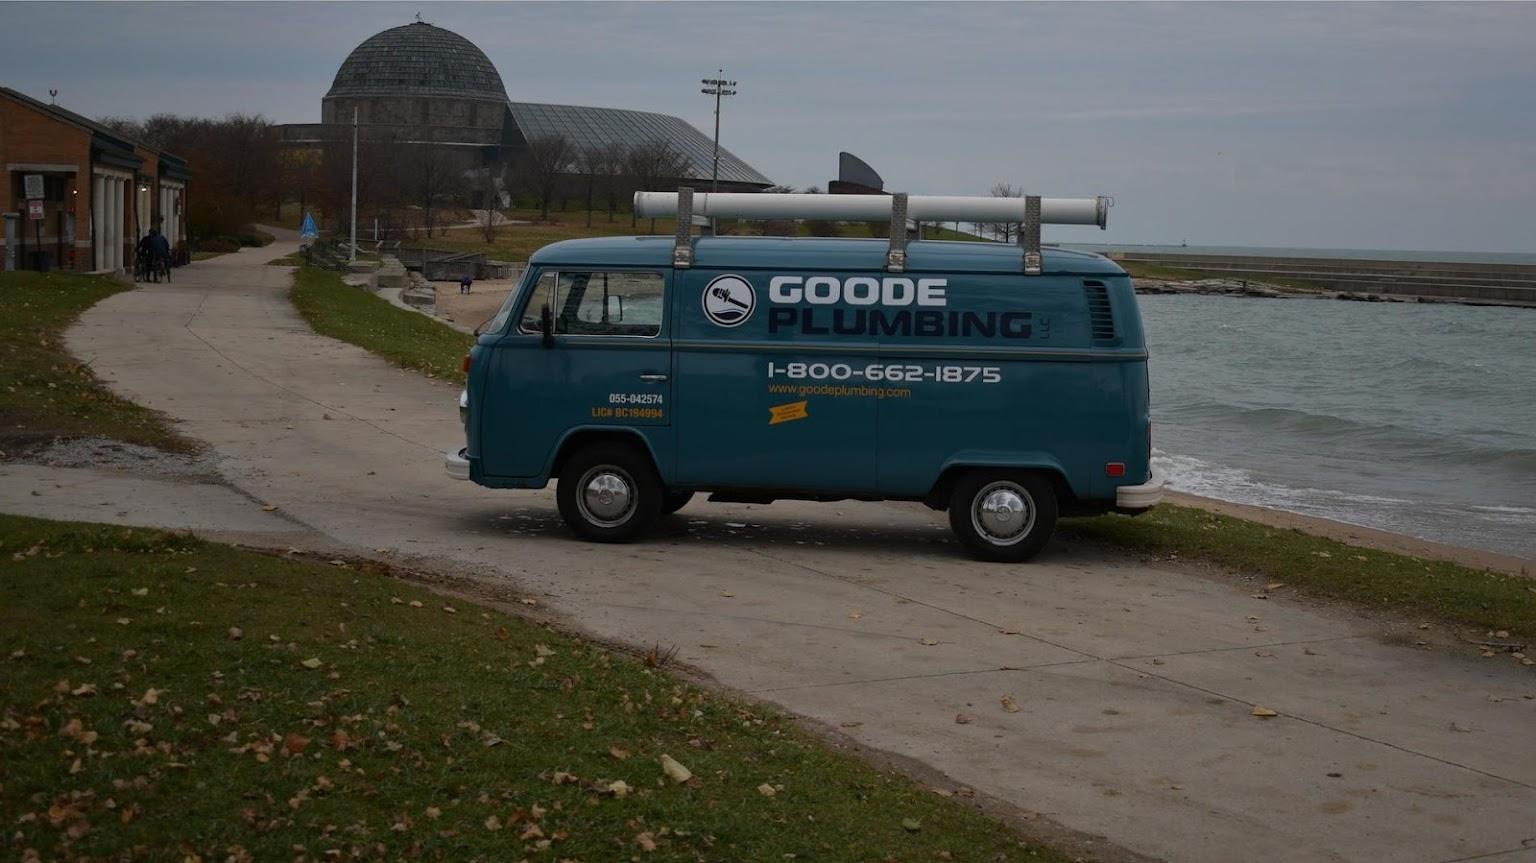 Goode Plumbing Service car